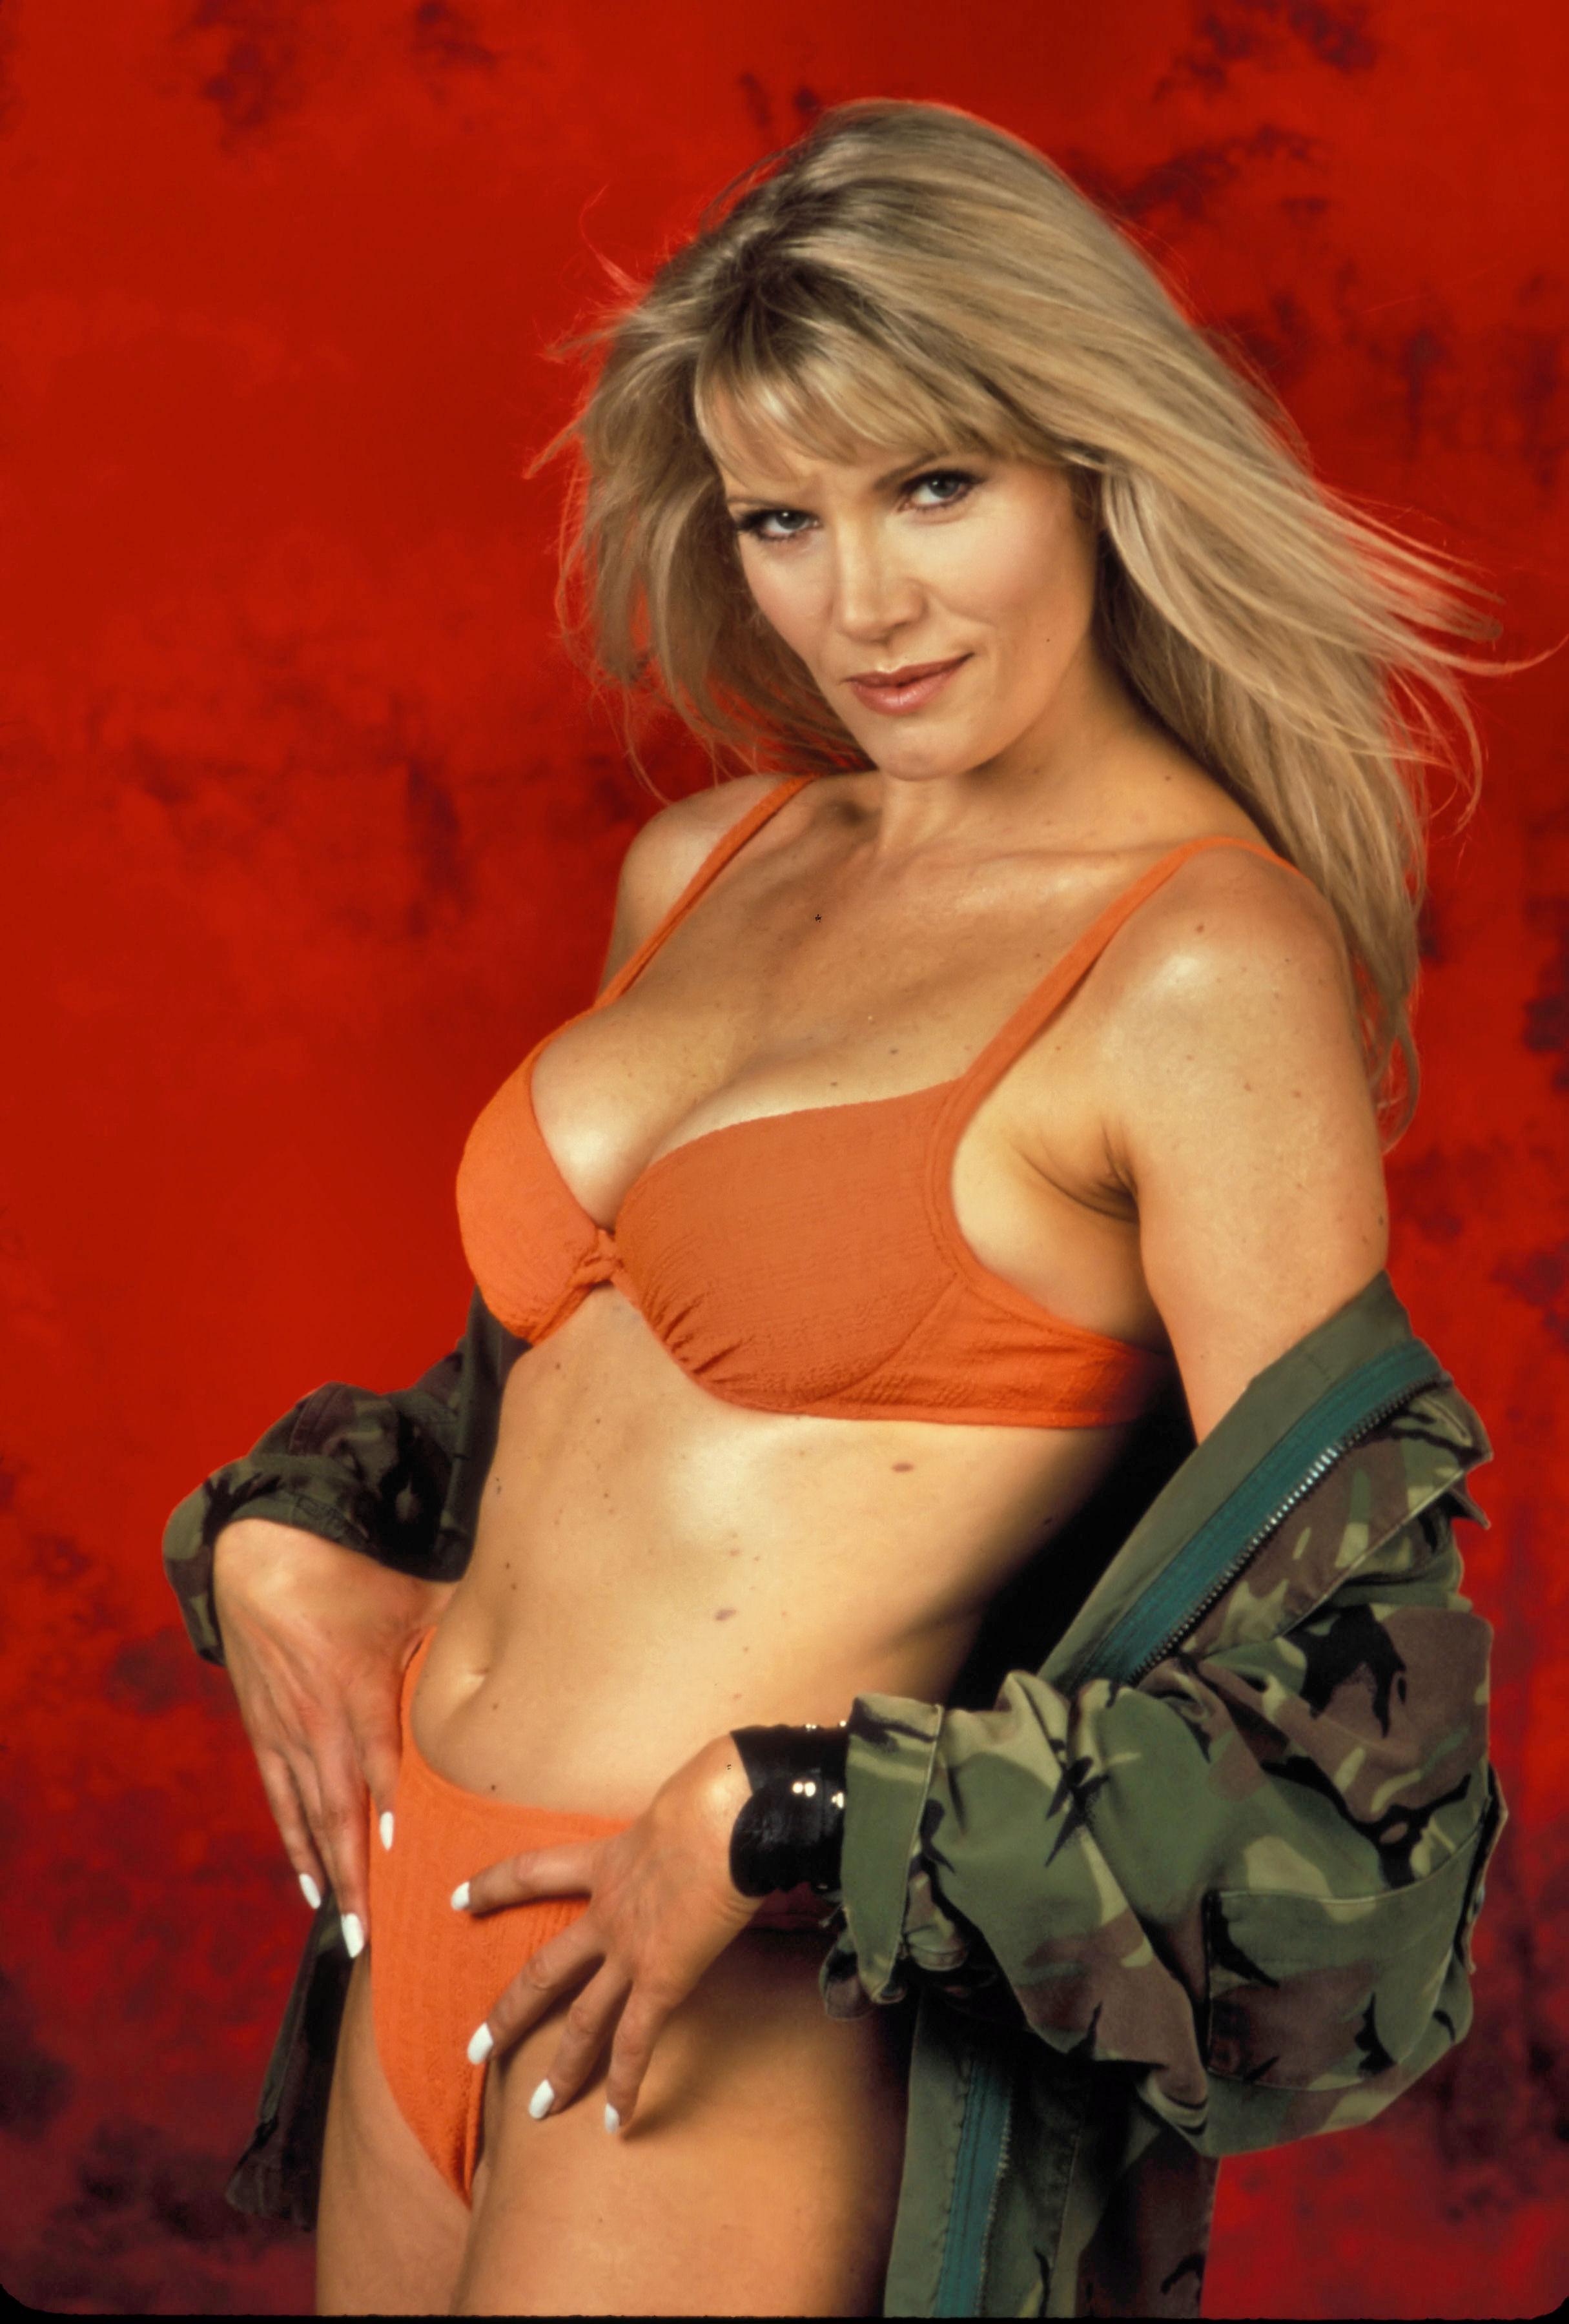 Lana Clarkson photo ga... Miranda Kerr